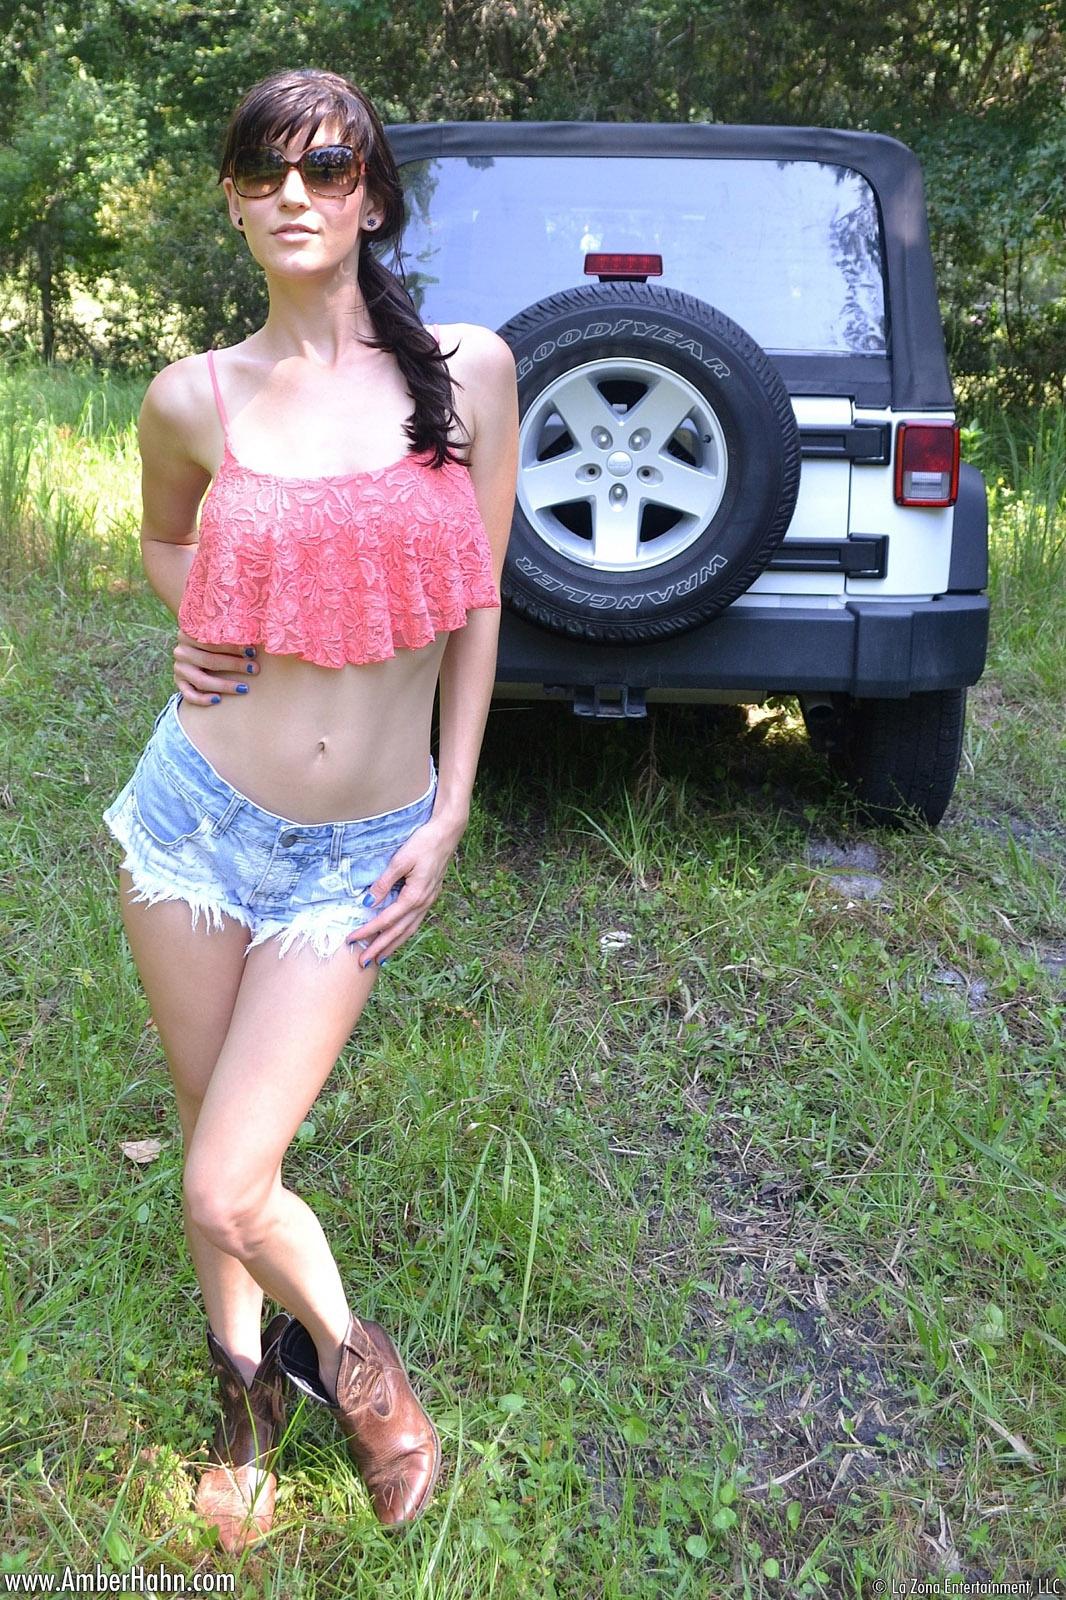 Dirty jeep girls doing photo 351